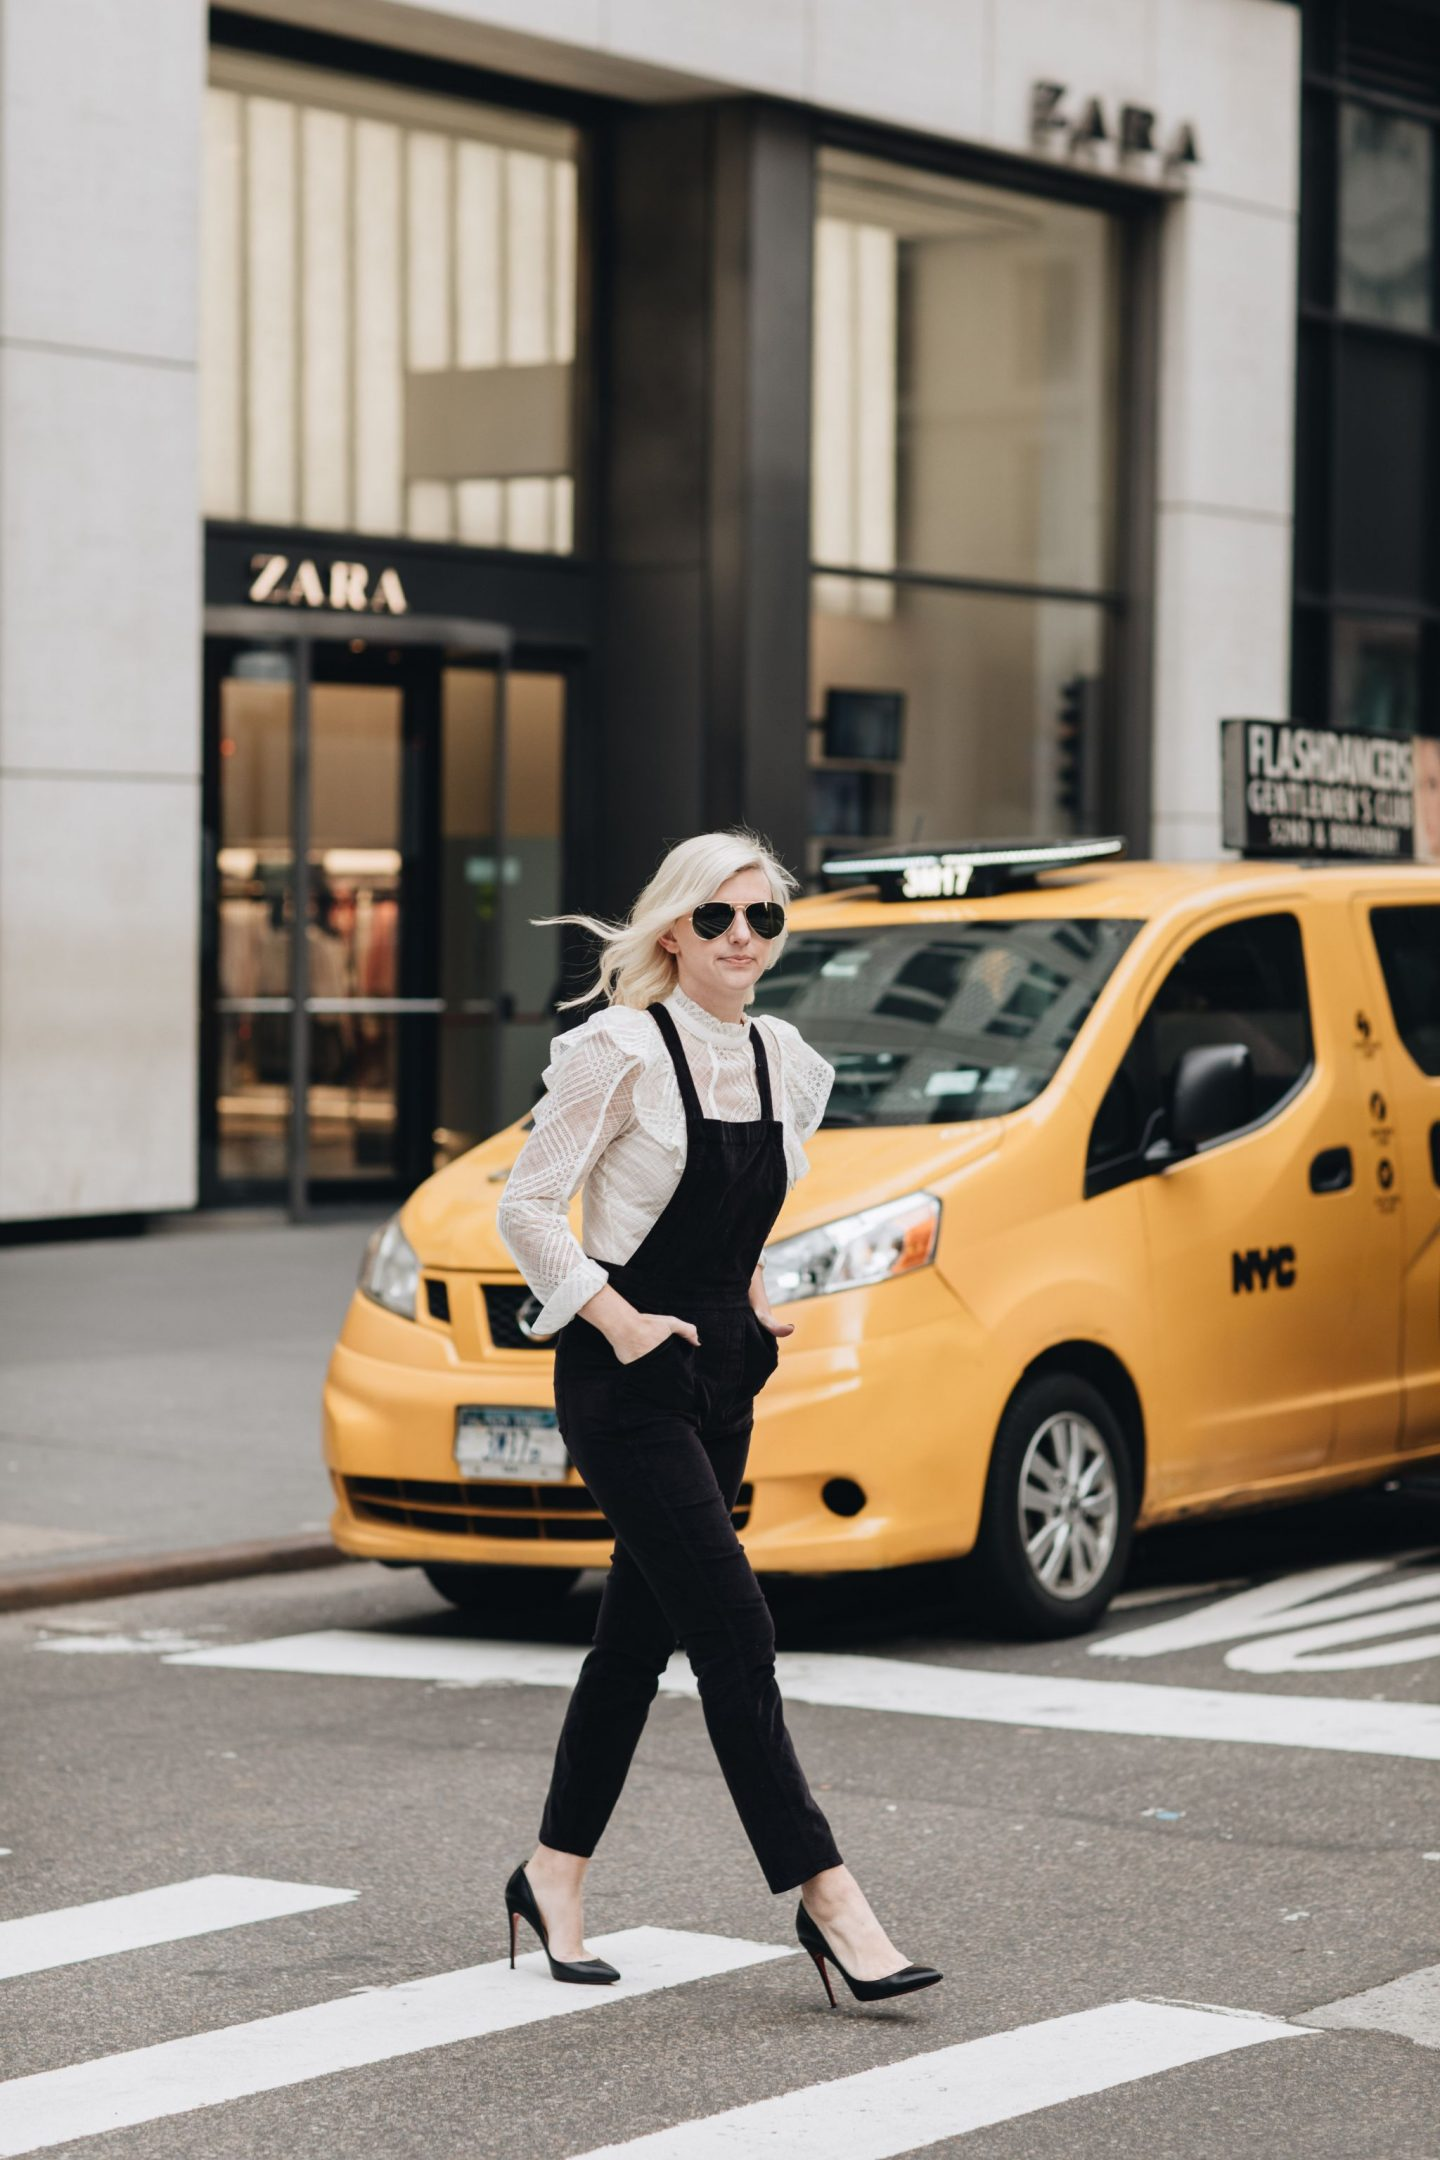 how to dress down louboutin heels, wearing heels in NYC, louboutin heels, how to dress up overalls